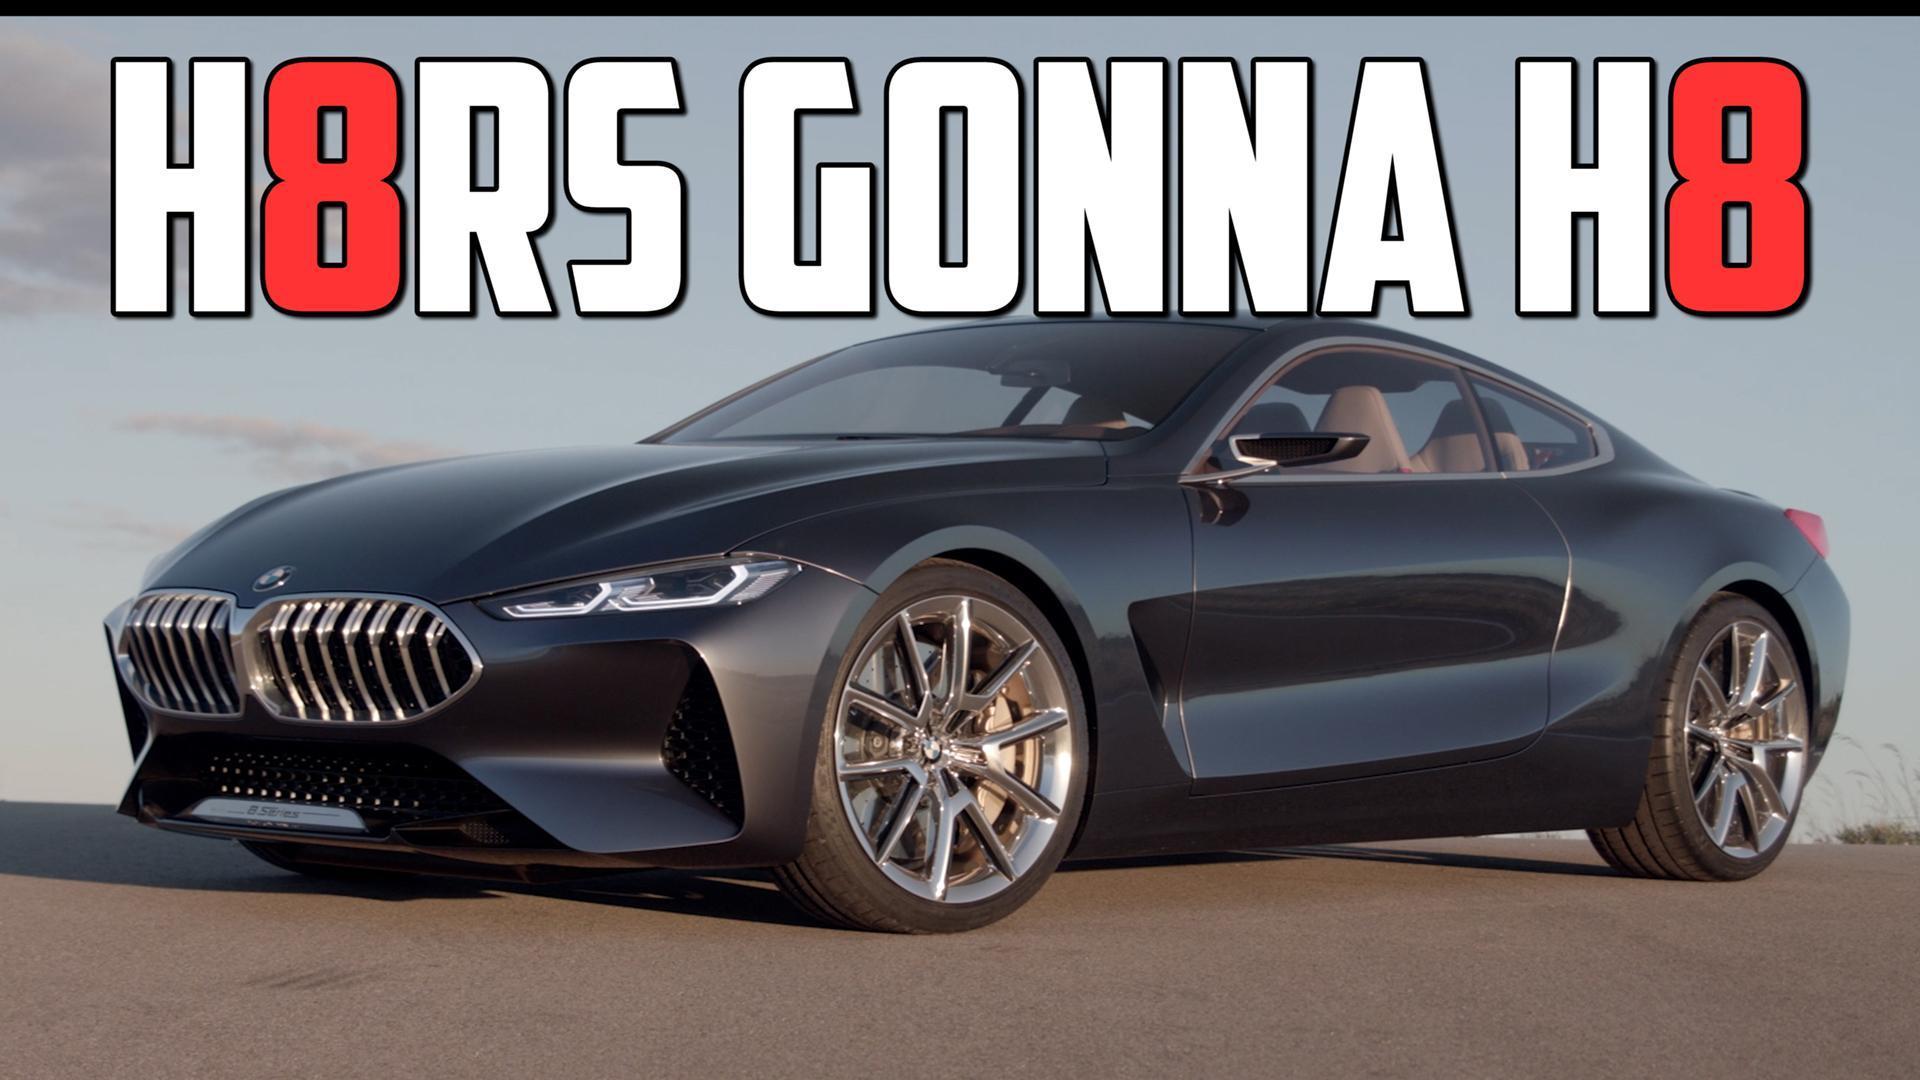 BMW recalling 1 million vehicles in North America Autoblog